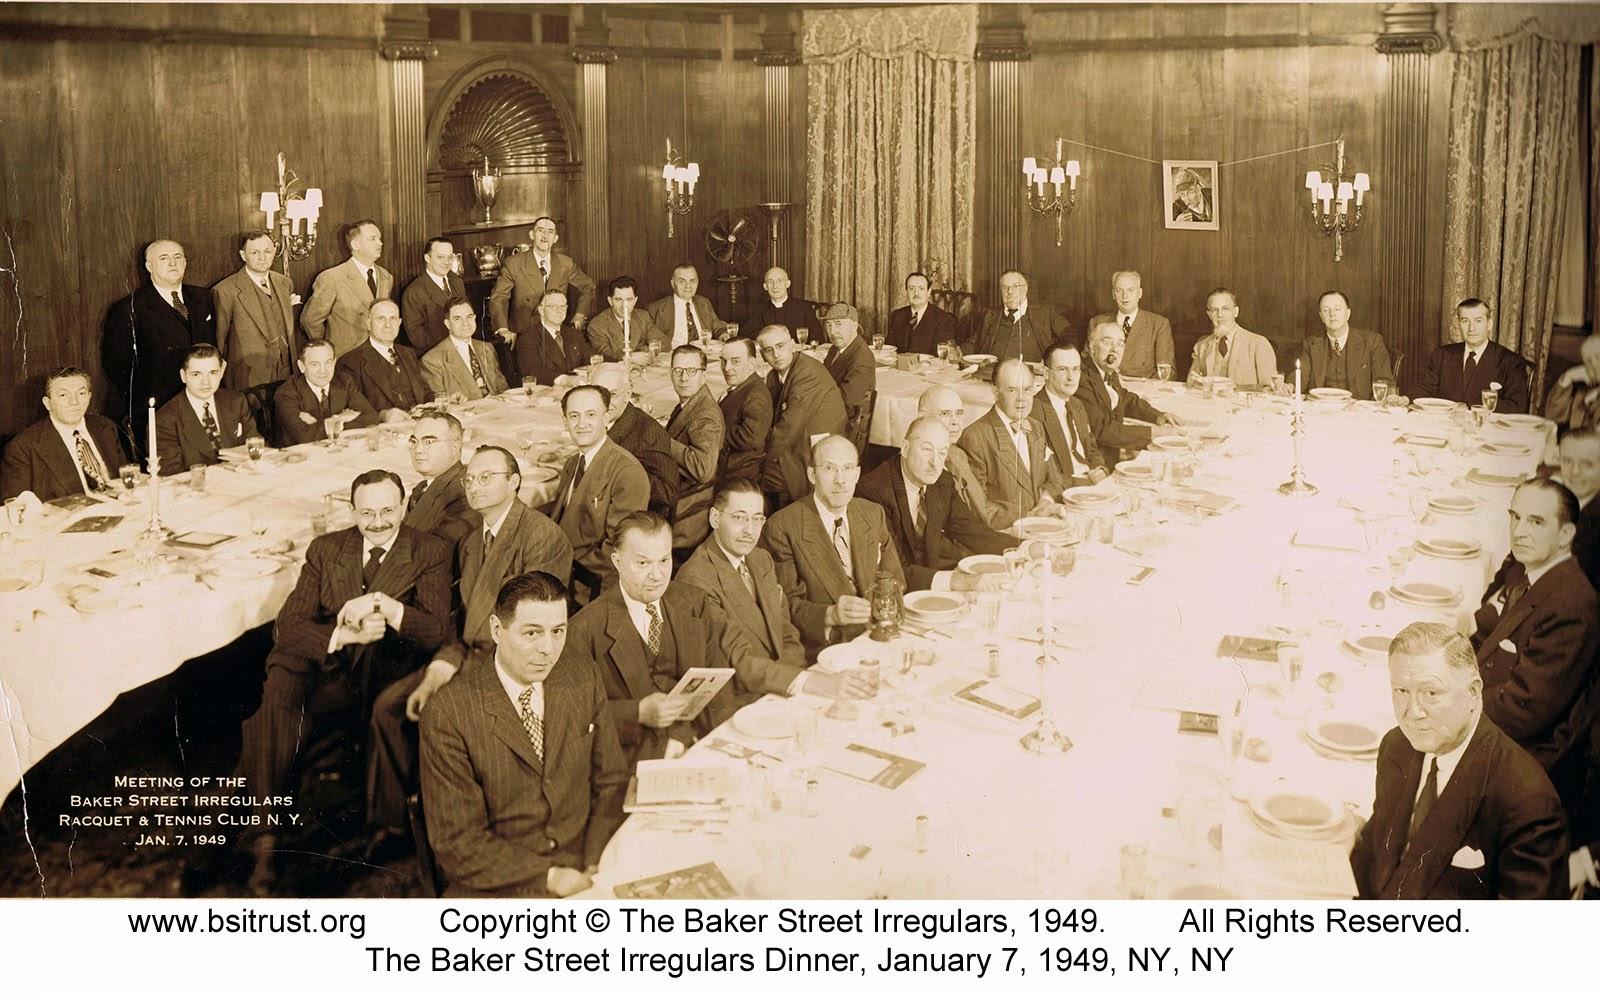 The 1949 BSI Dinner group photo